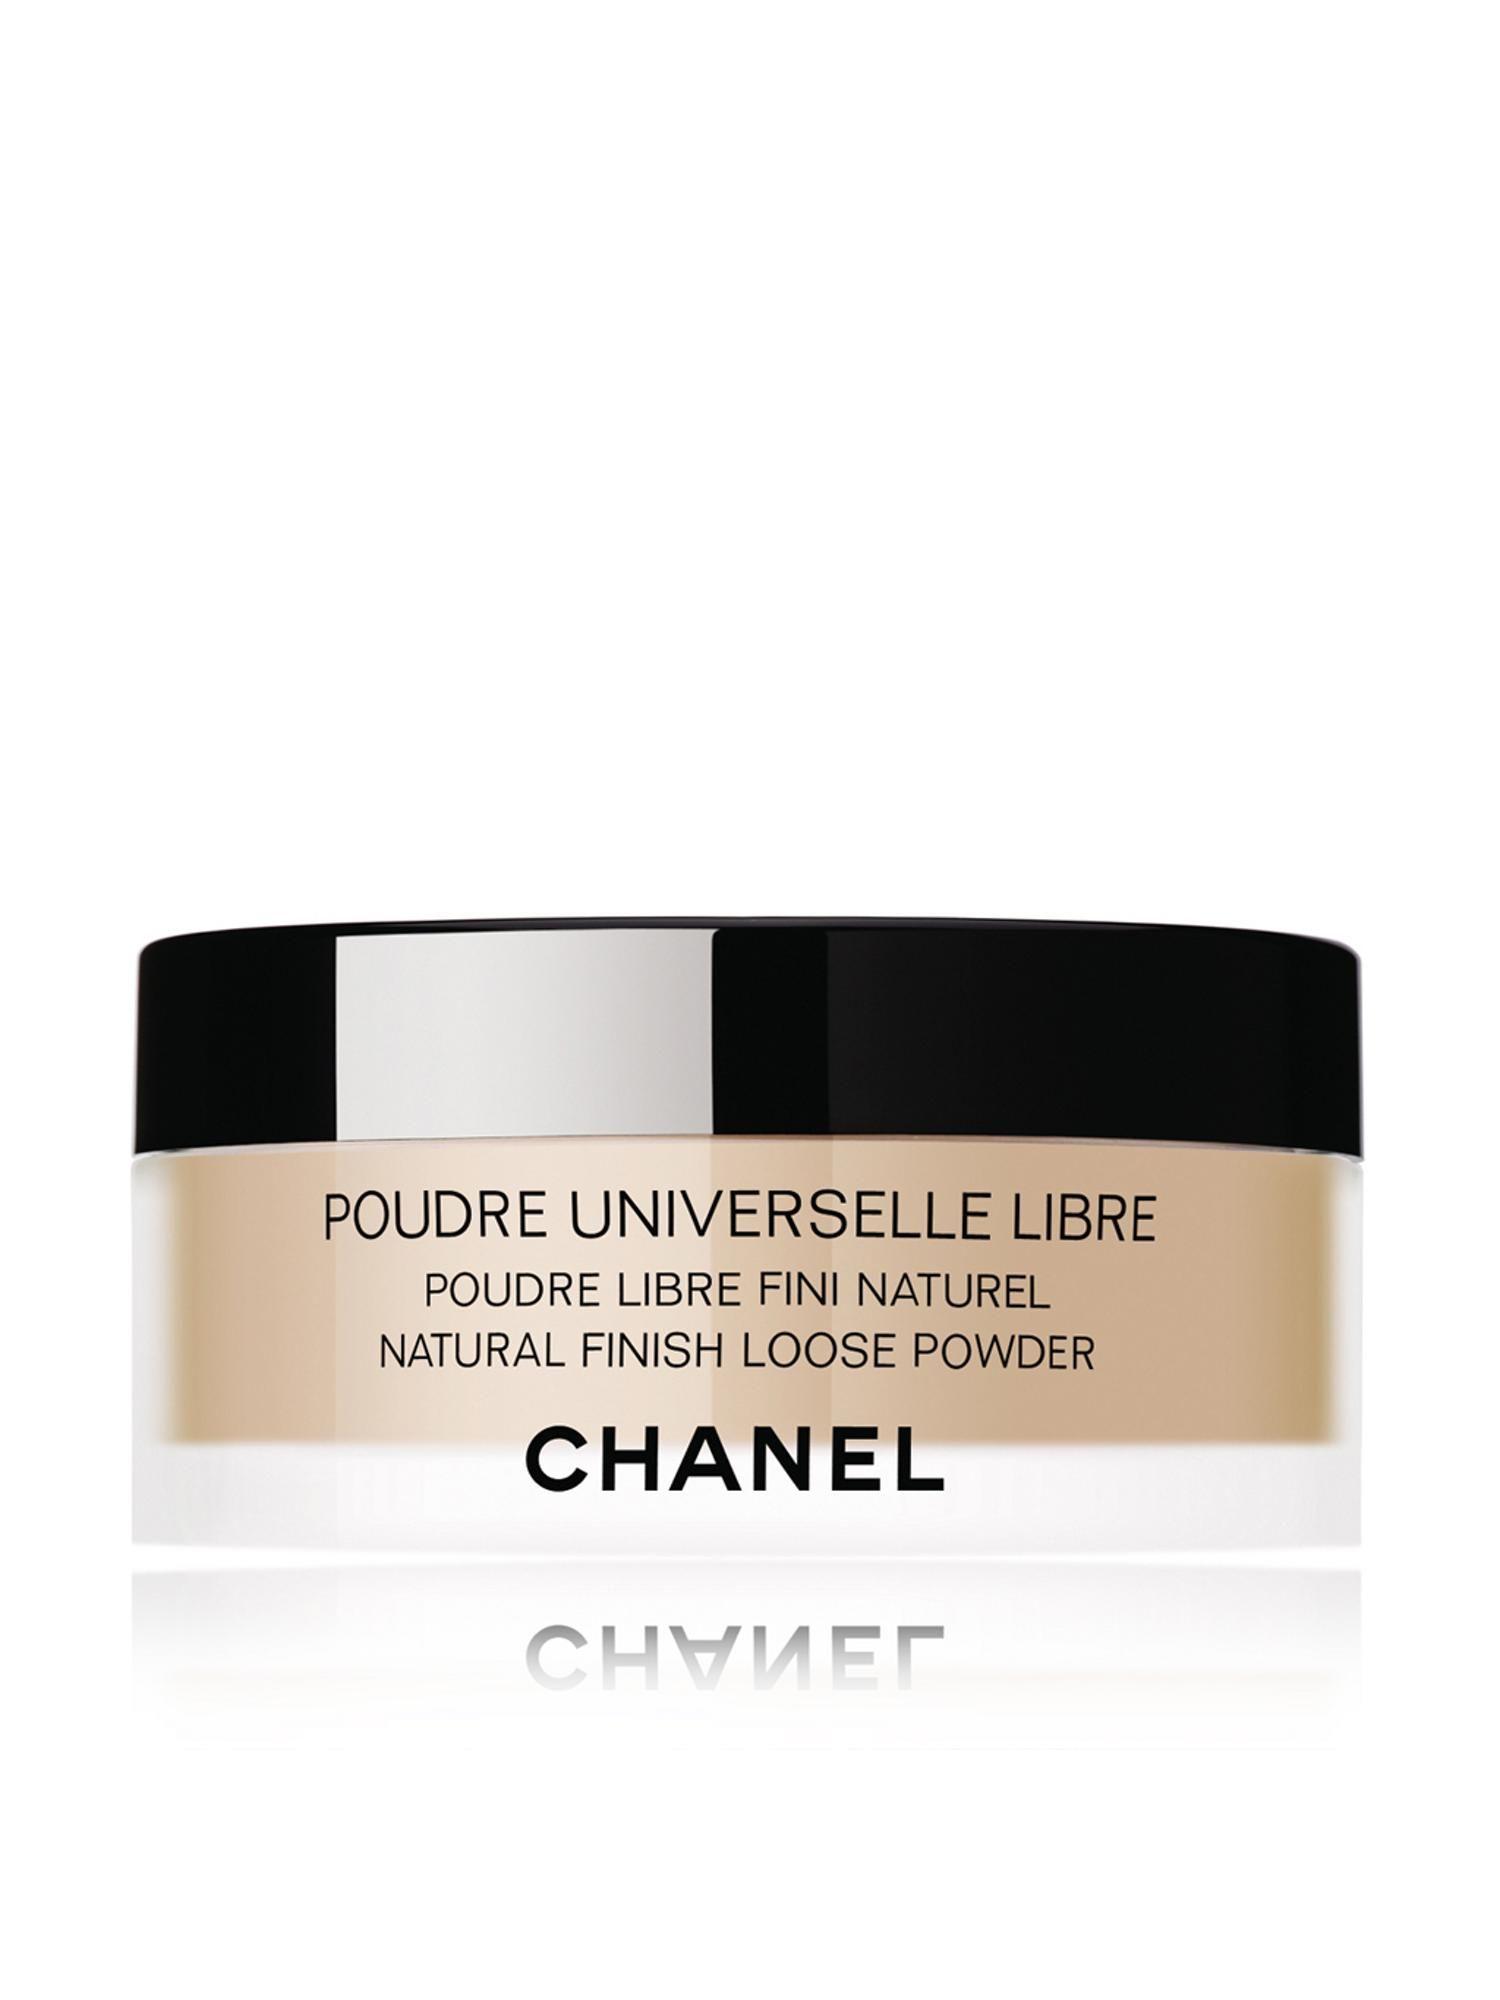 Chanel Poudre Universelle Libre Natural Loose Powder Finish